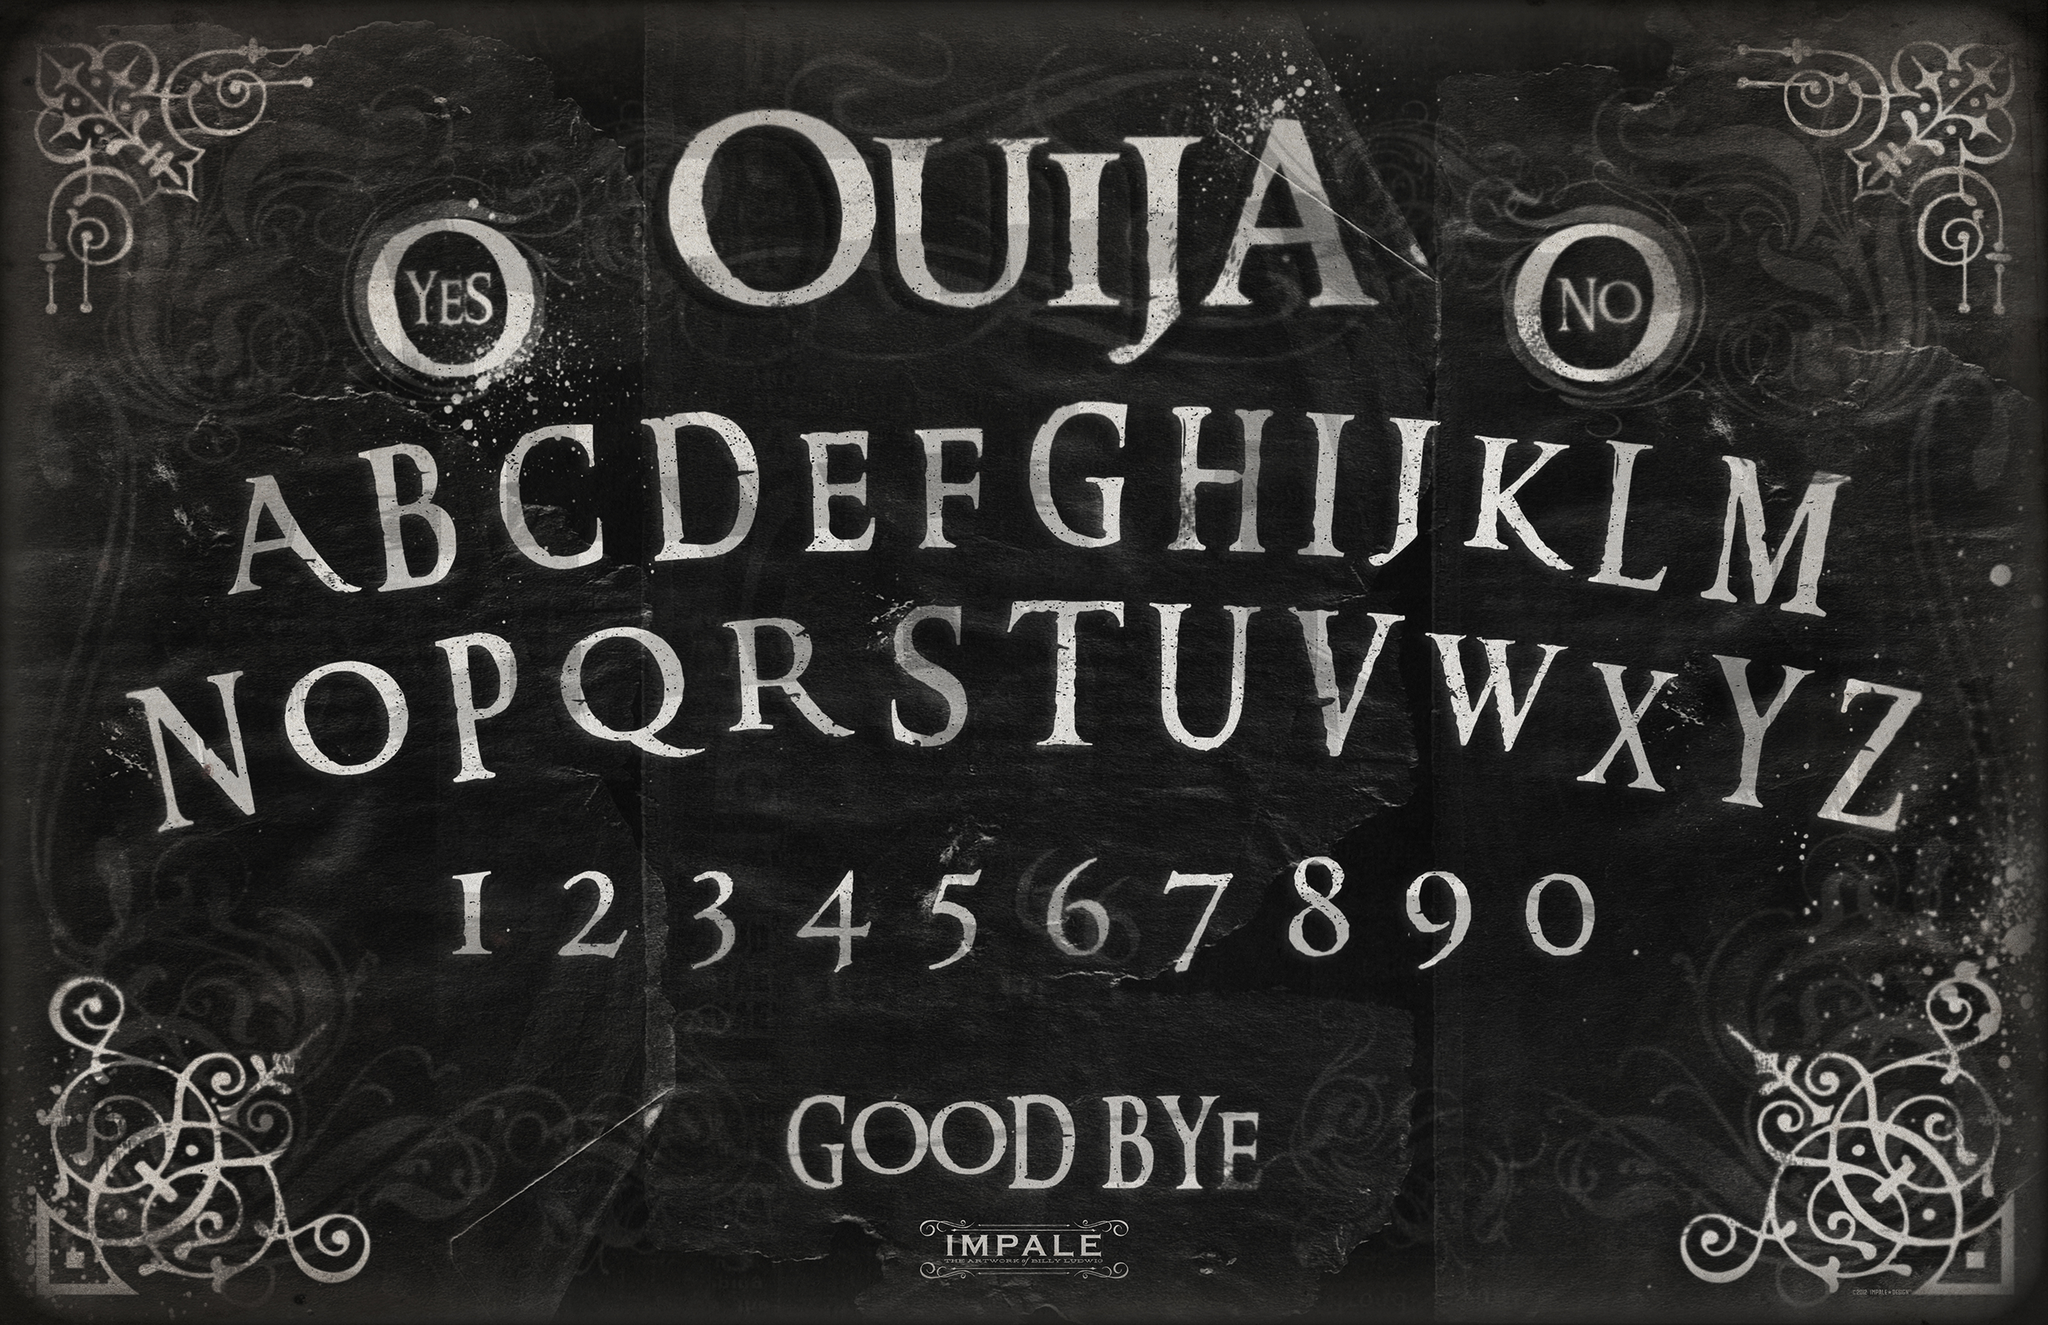 Ouija Classic Black Ouija Ouija Board Halloween Chalkboard Art